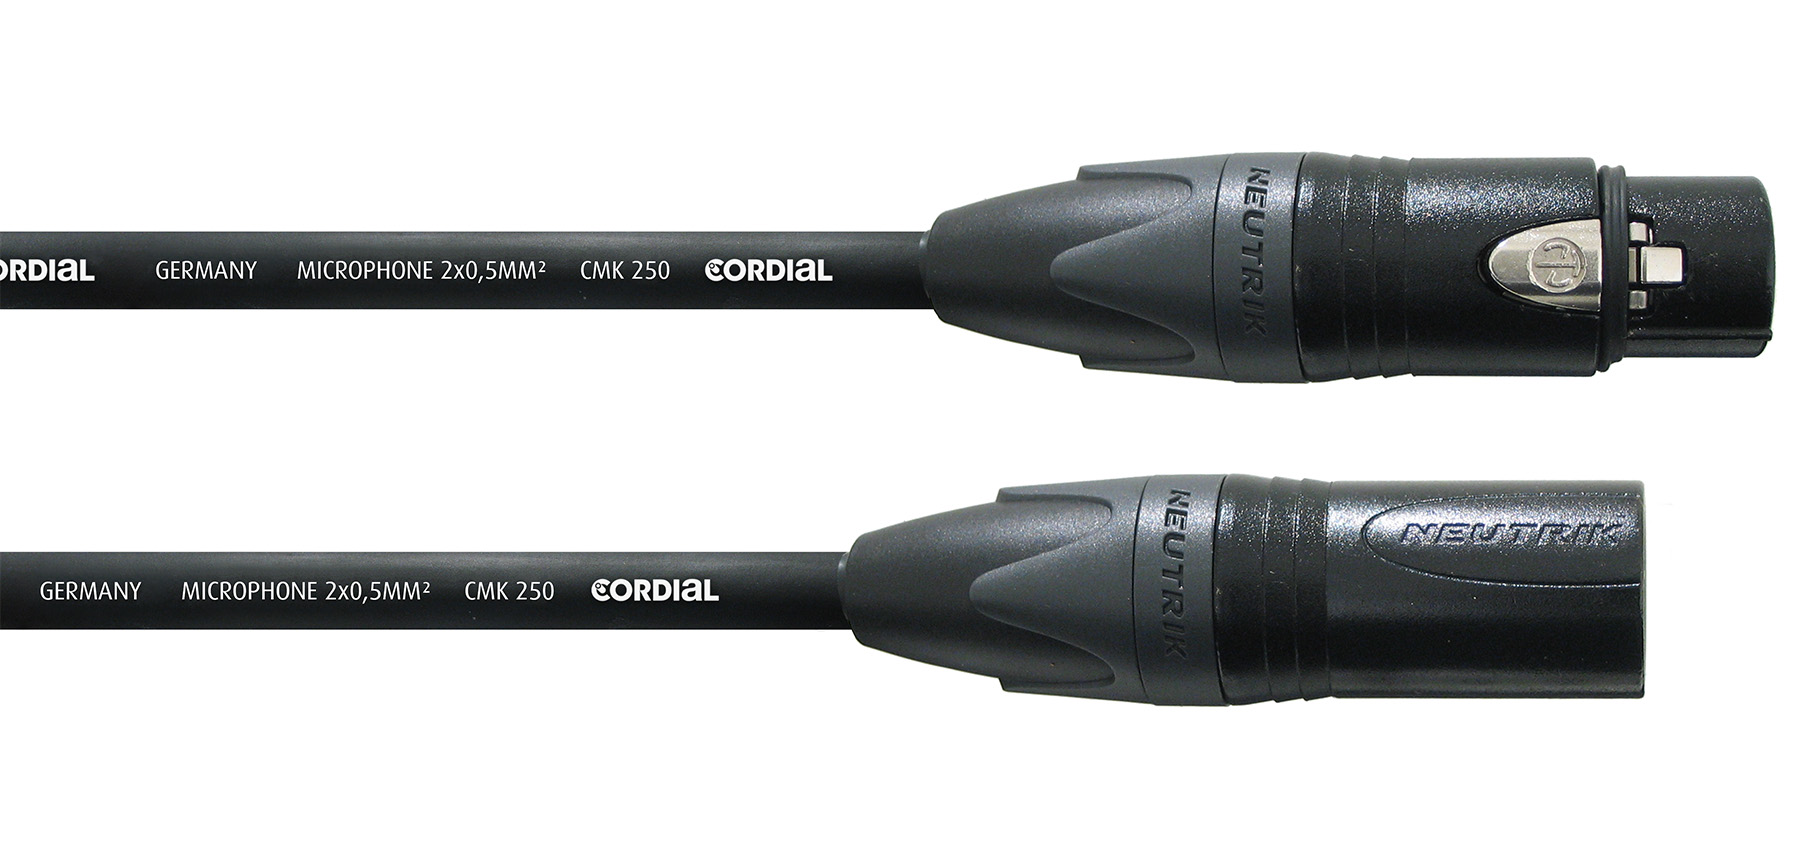 News: Cordial bringt Studio-Mikrofonkabel CSM FM Gold 250 heraus